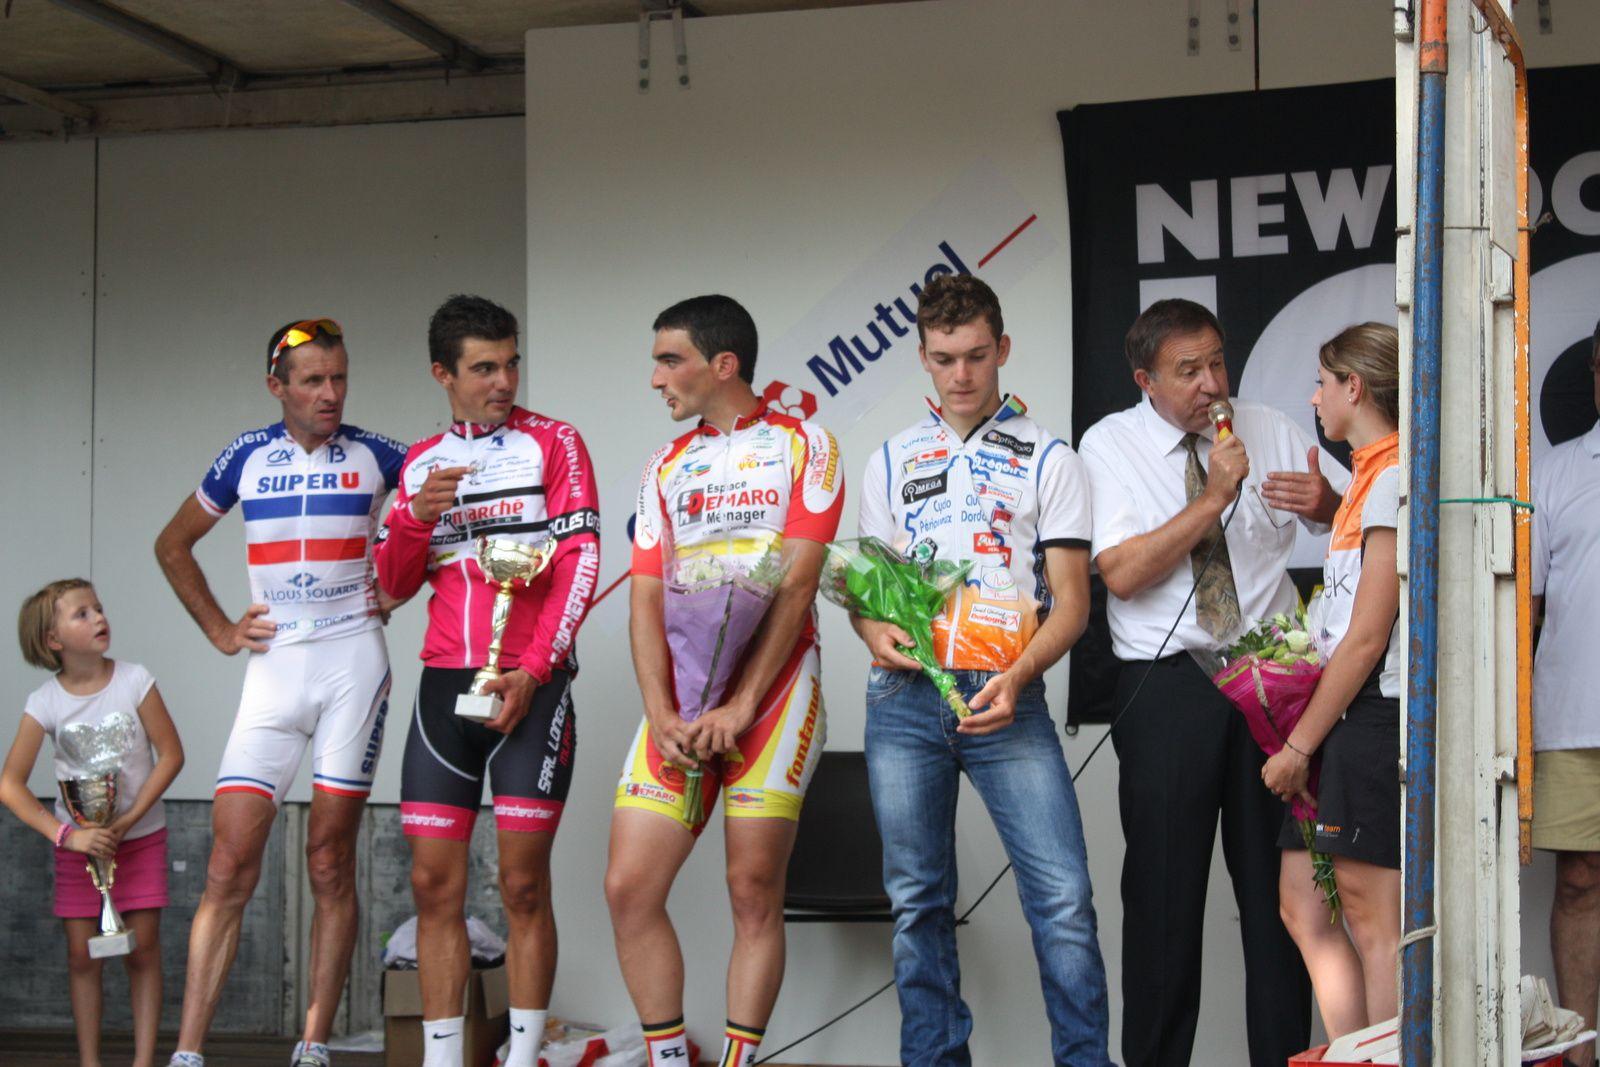 Le  podium  avec  Mélanie  BRAVARD  au  micro  d'Alain  LAGARDE